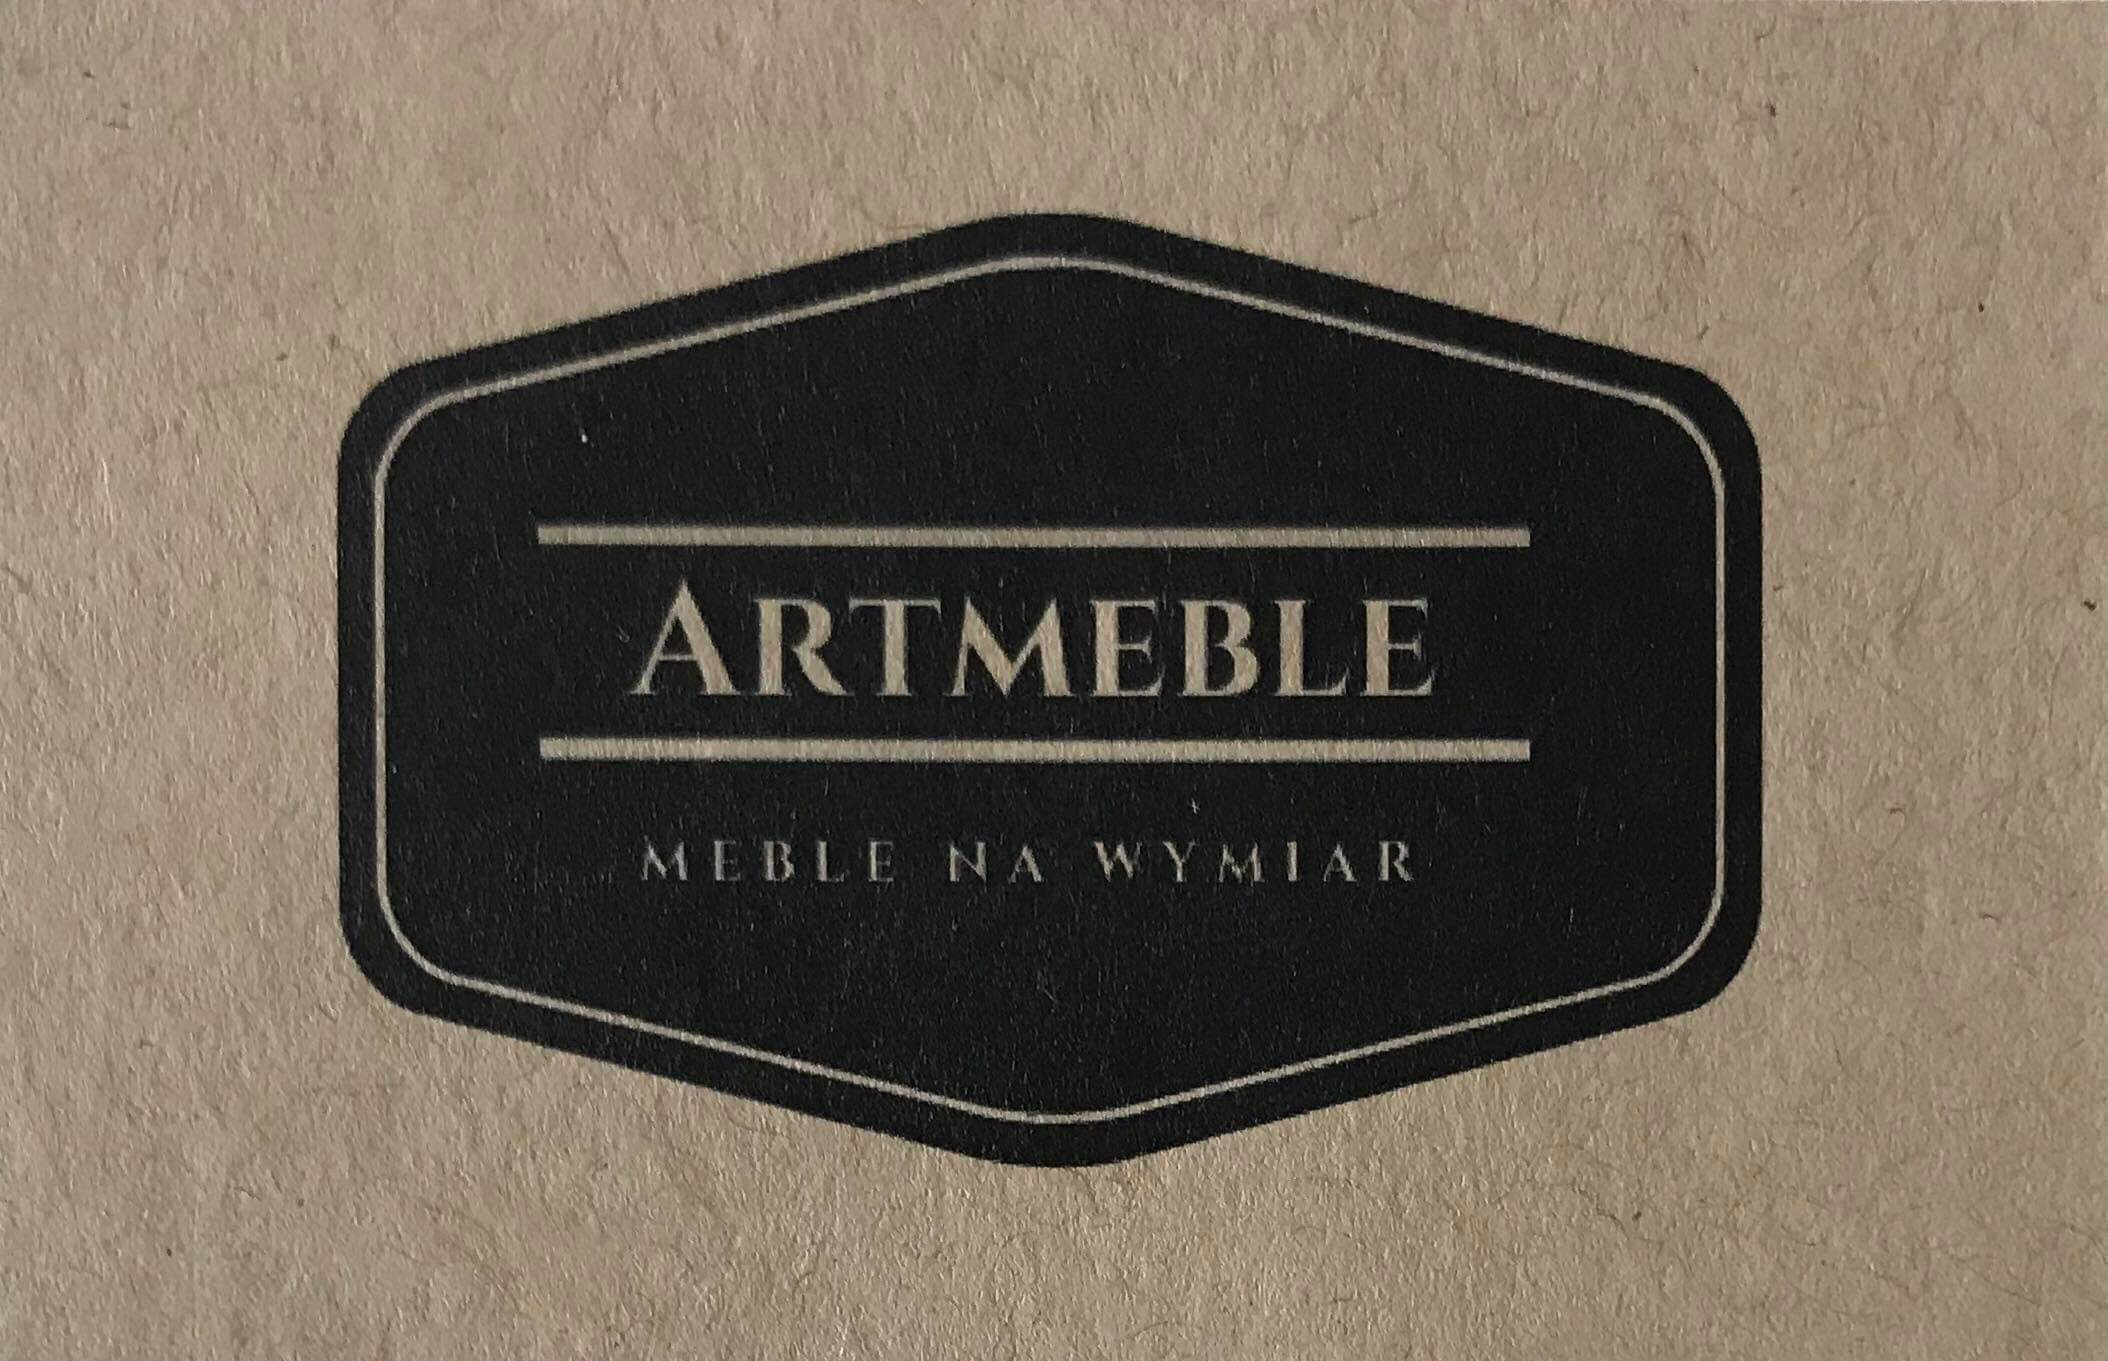 ArtMeble